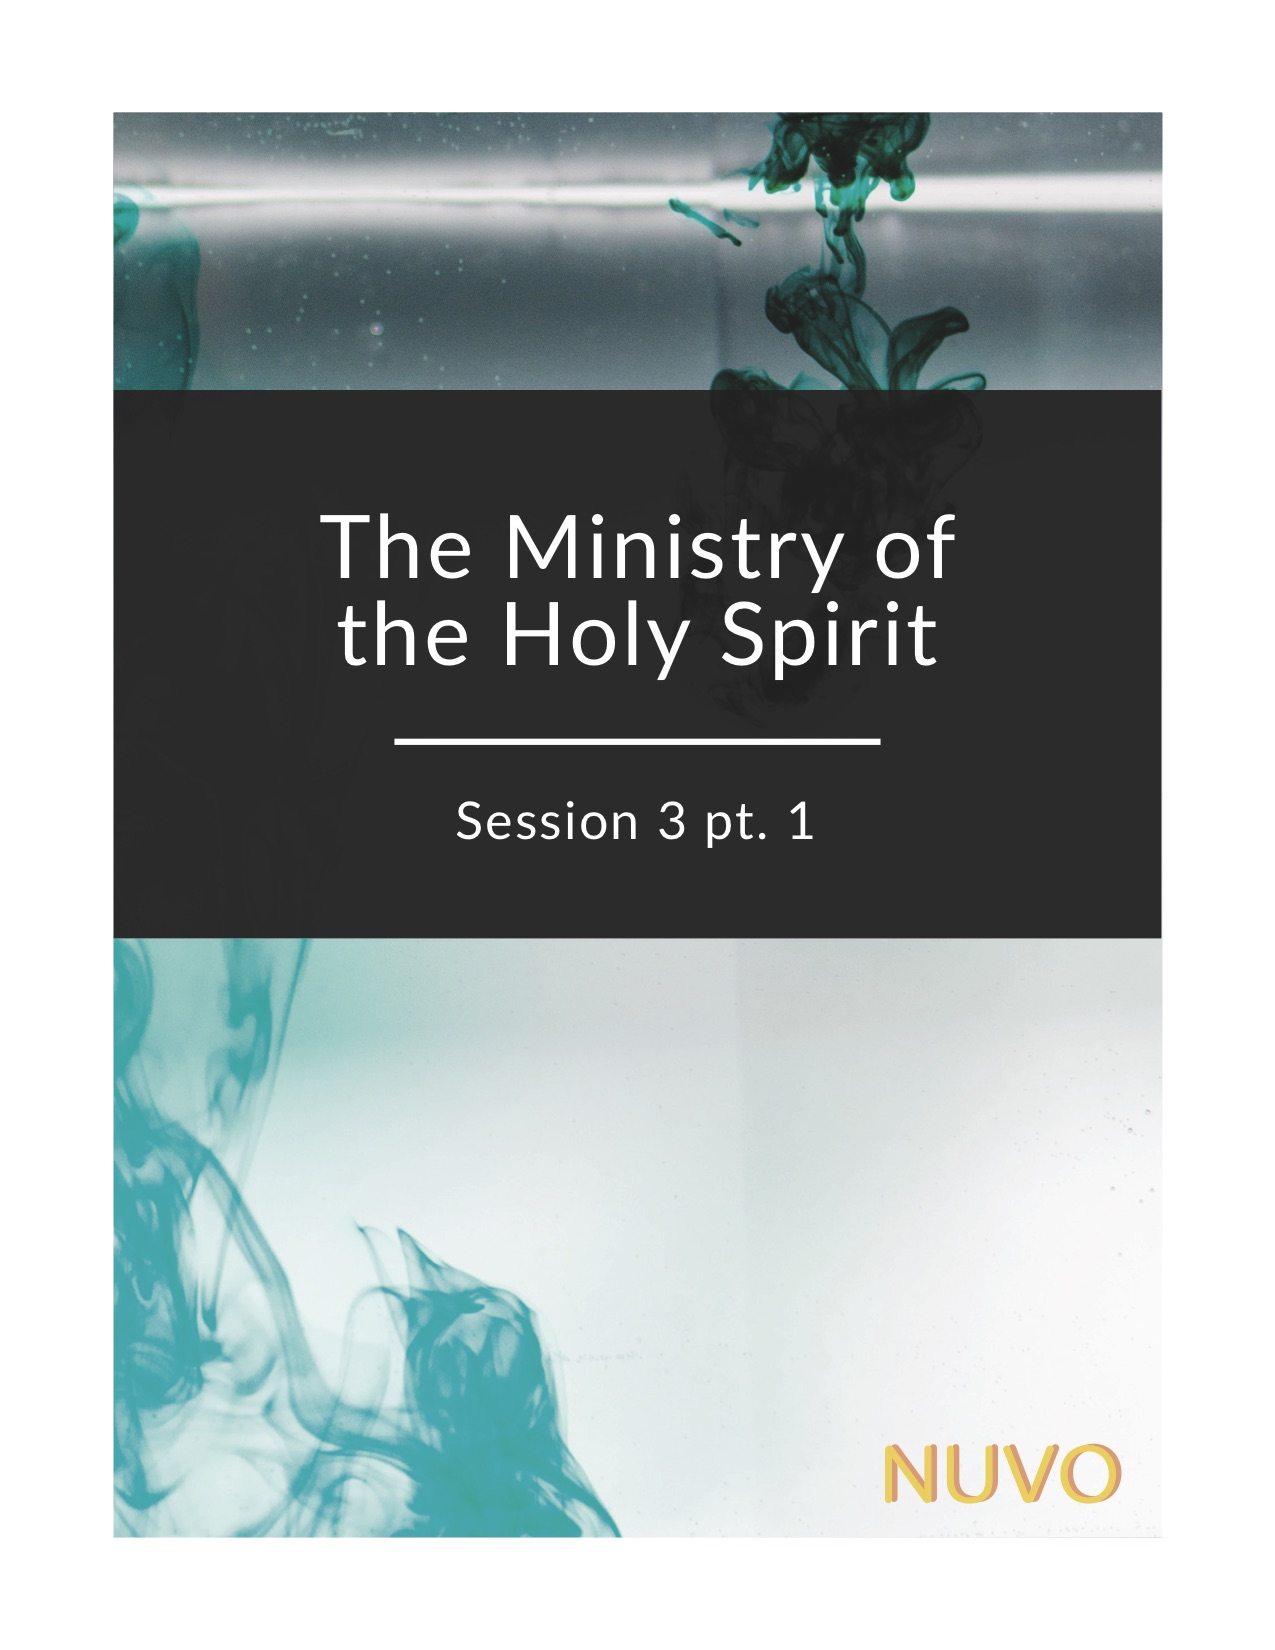 s03-pt1-the-ministry-of-the-holy-spirit.jpg